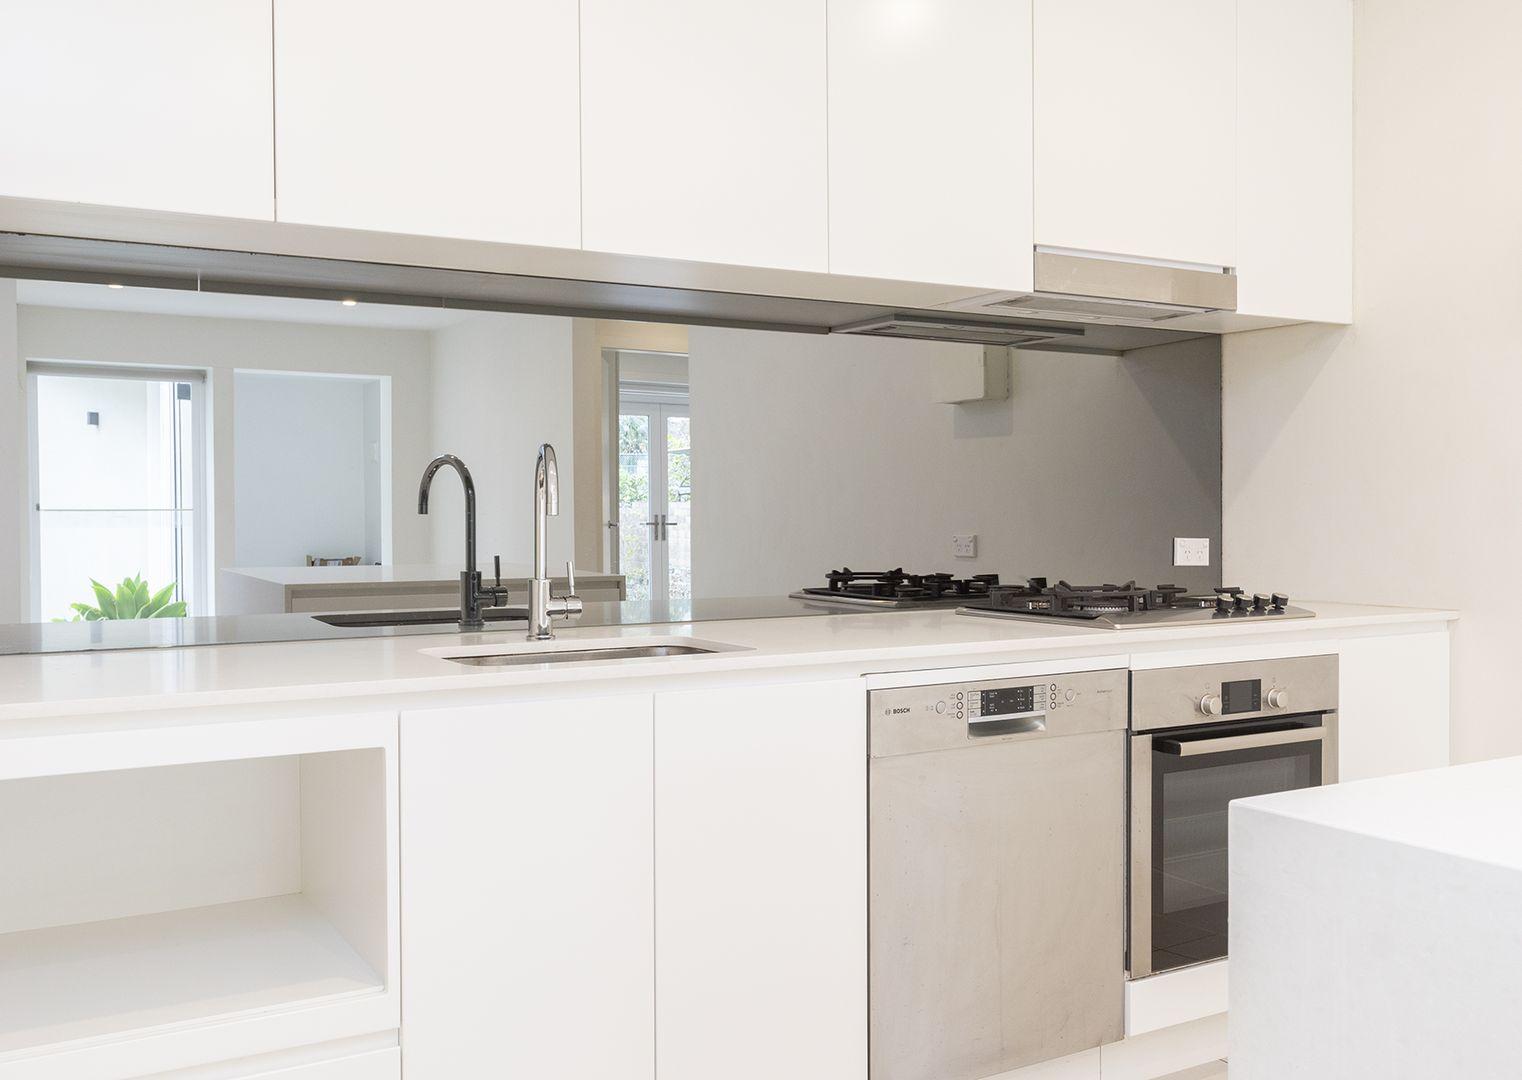 14B Winkurra Street, Kensington NSW 2033, Image 1